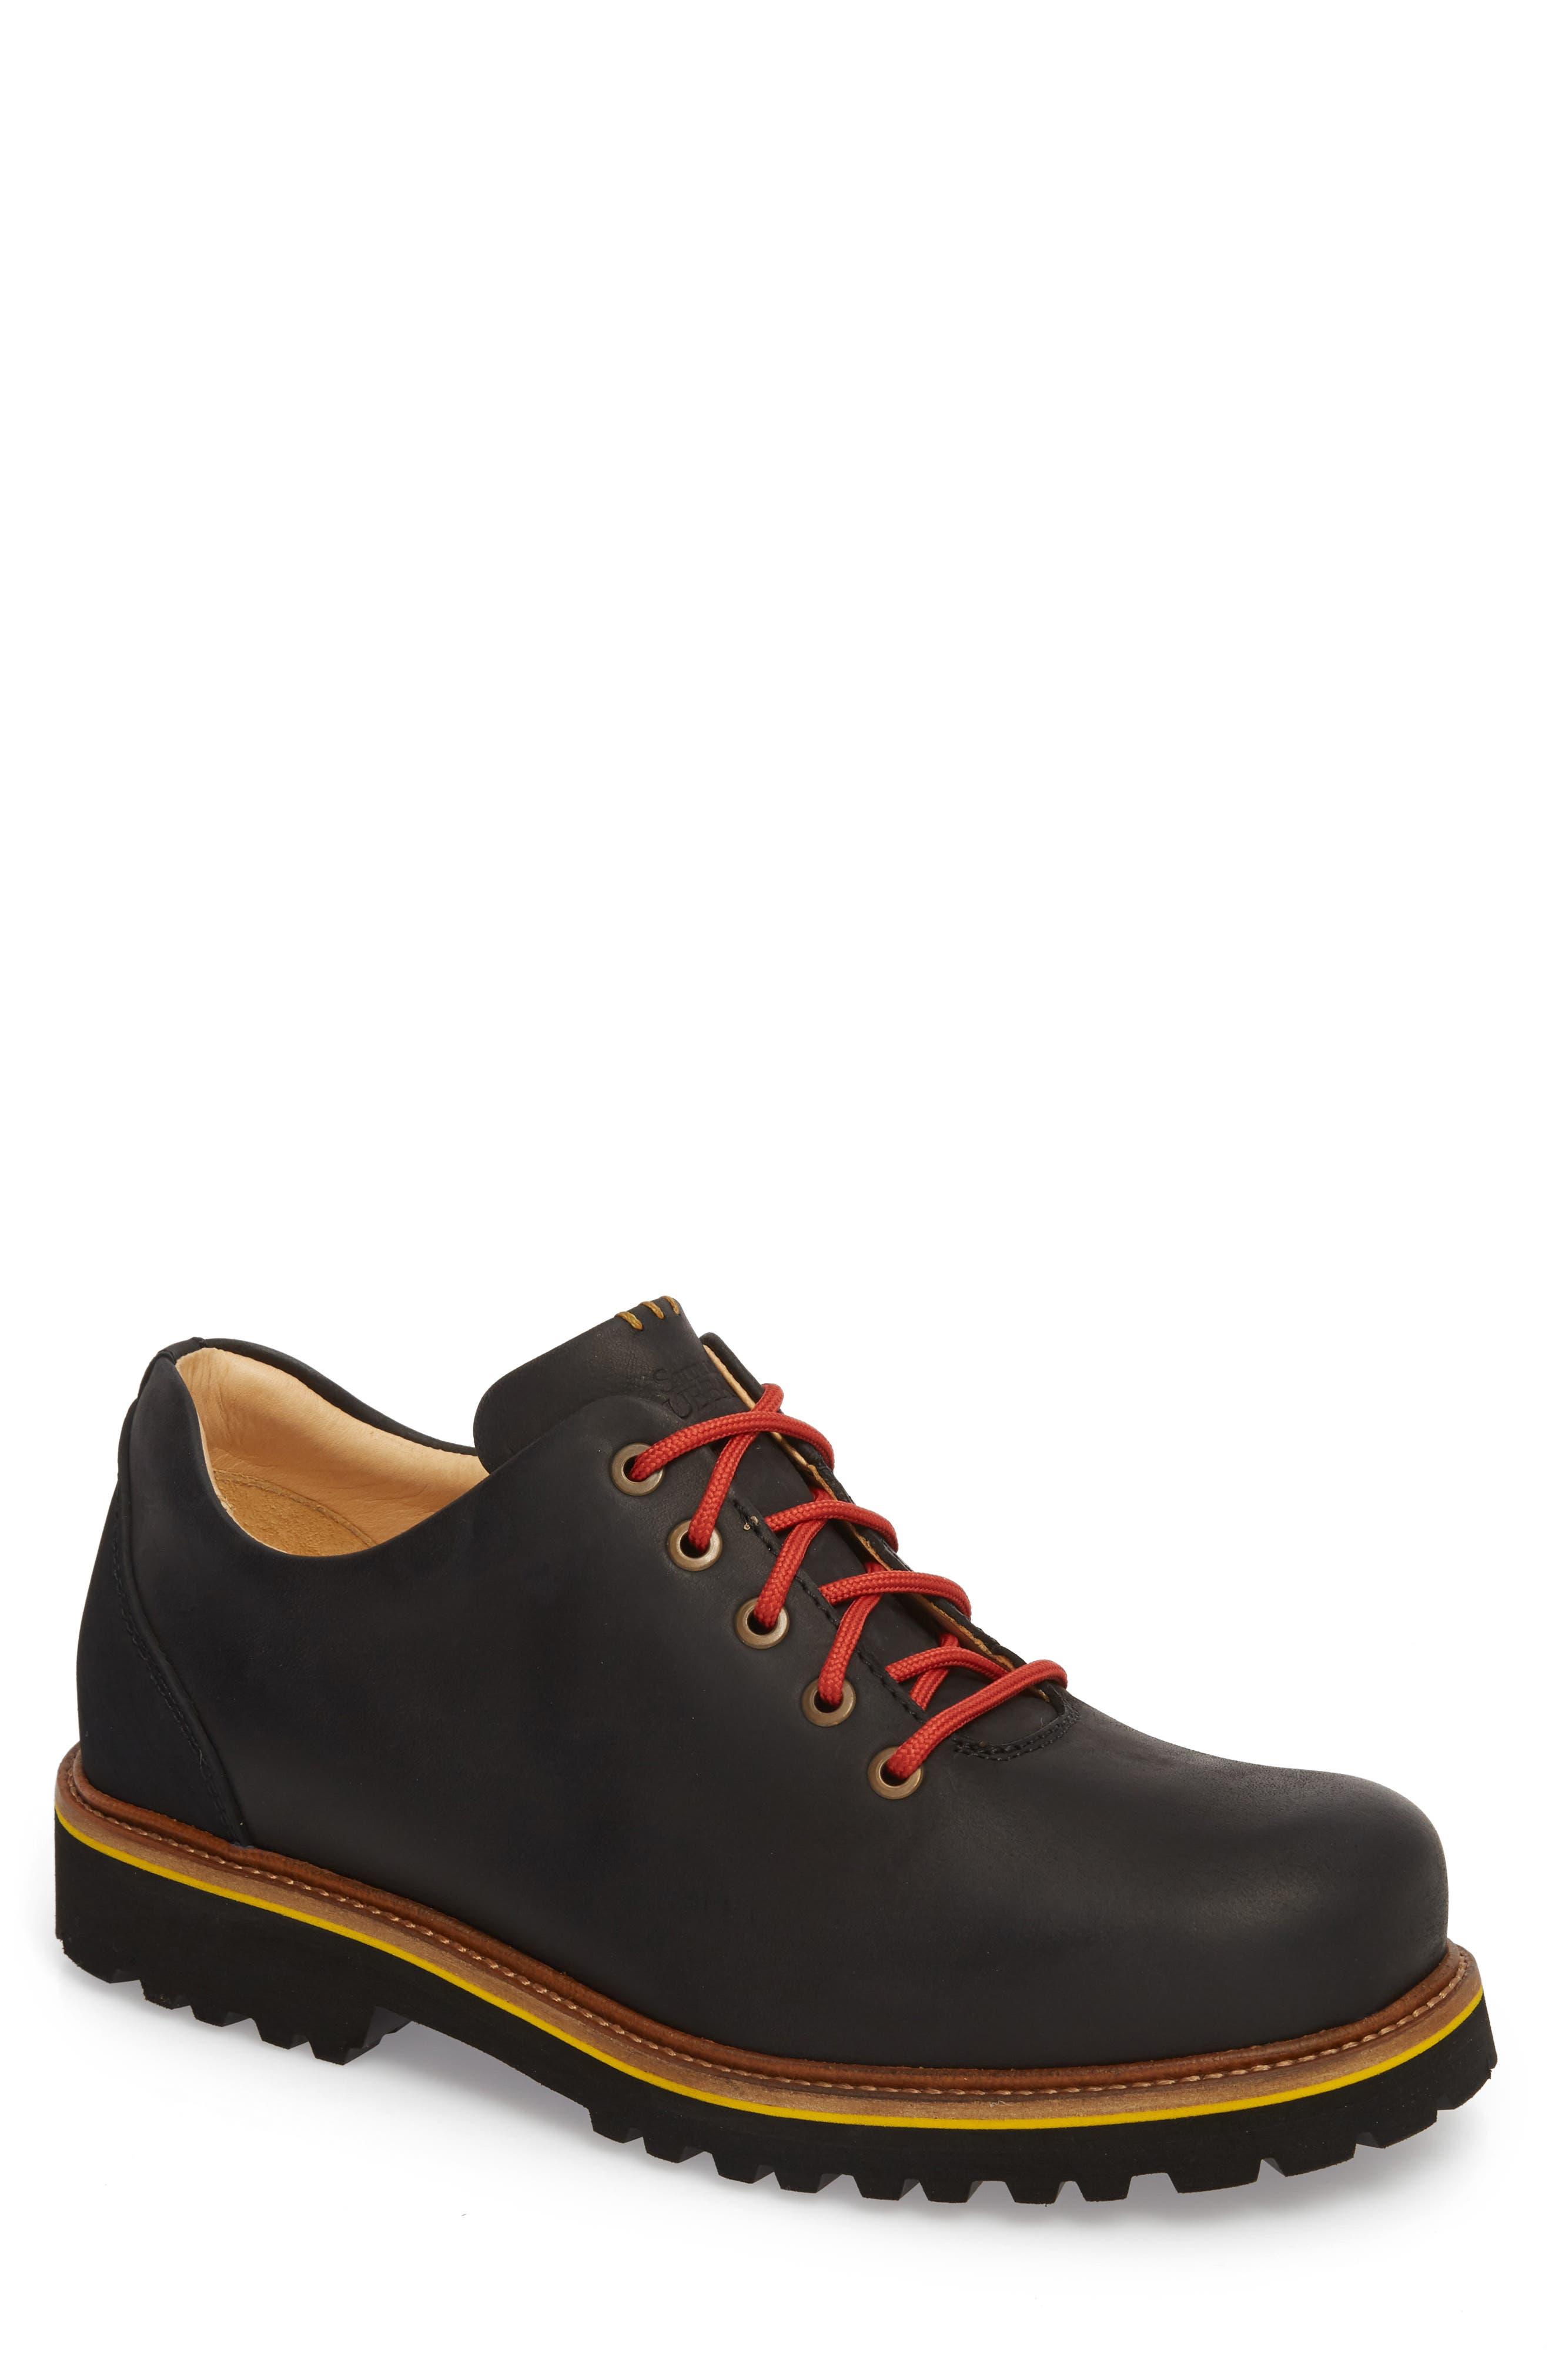 Fresh Plain Toe Oxford,                         Main,                         color, BLACK WAXED LEATHER